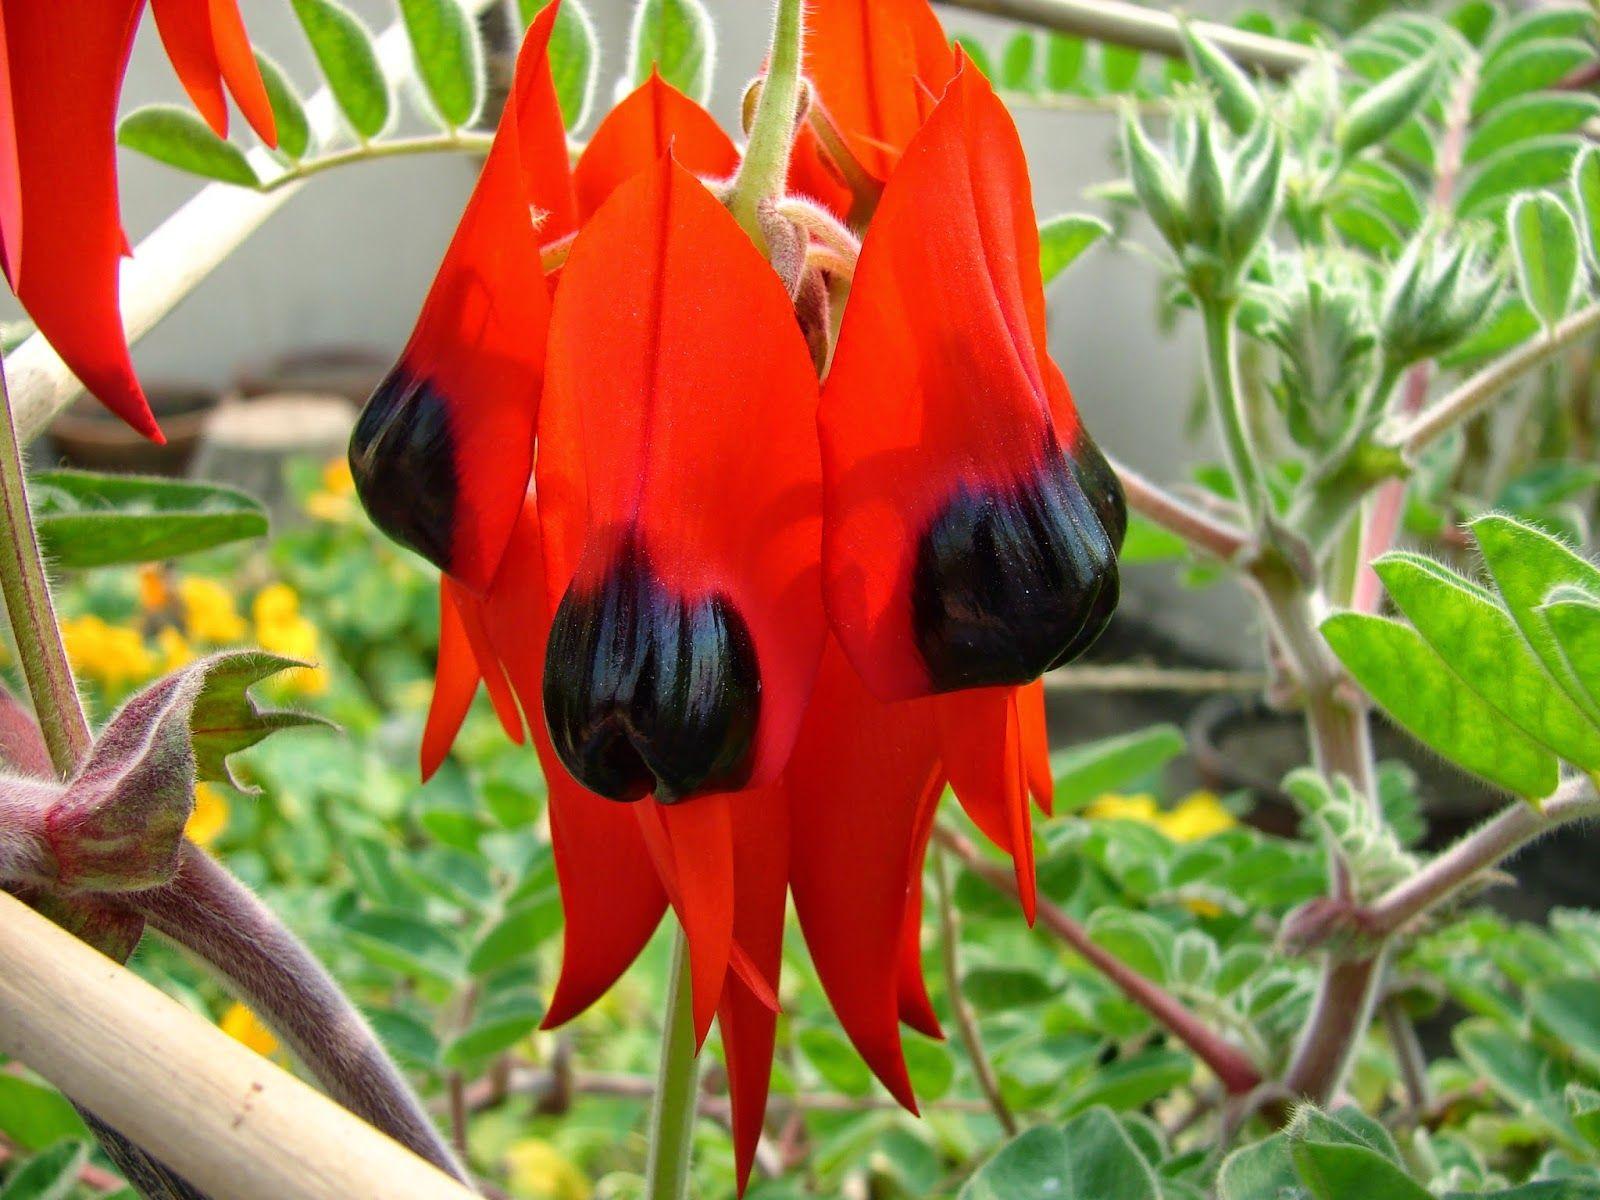 Clianthus Flower The Wonder Flowers Of Kolkata India Planting Flowers Flowers Plants Online